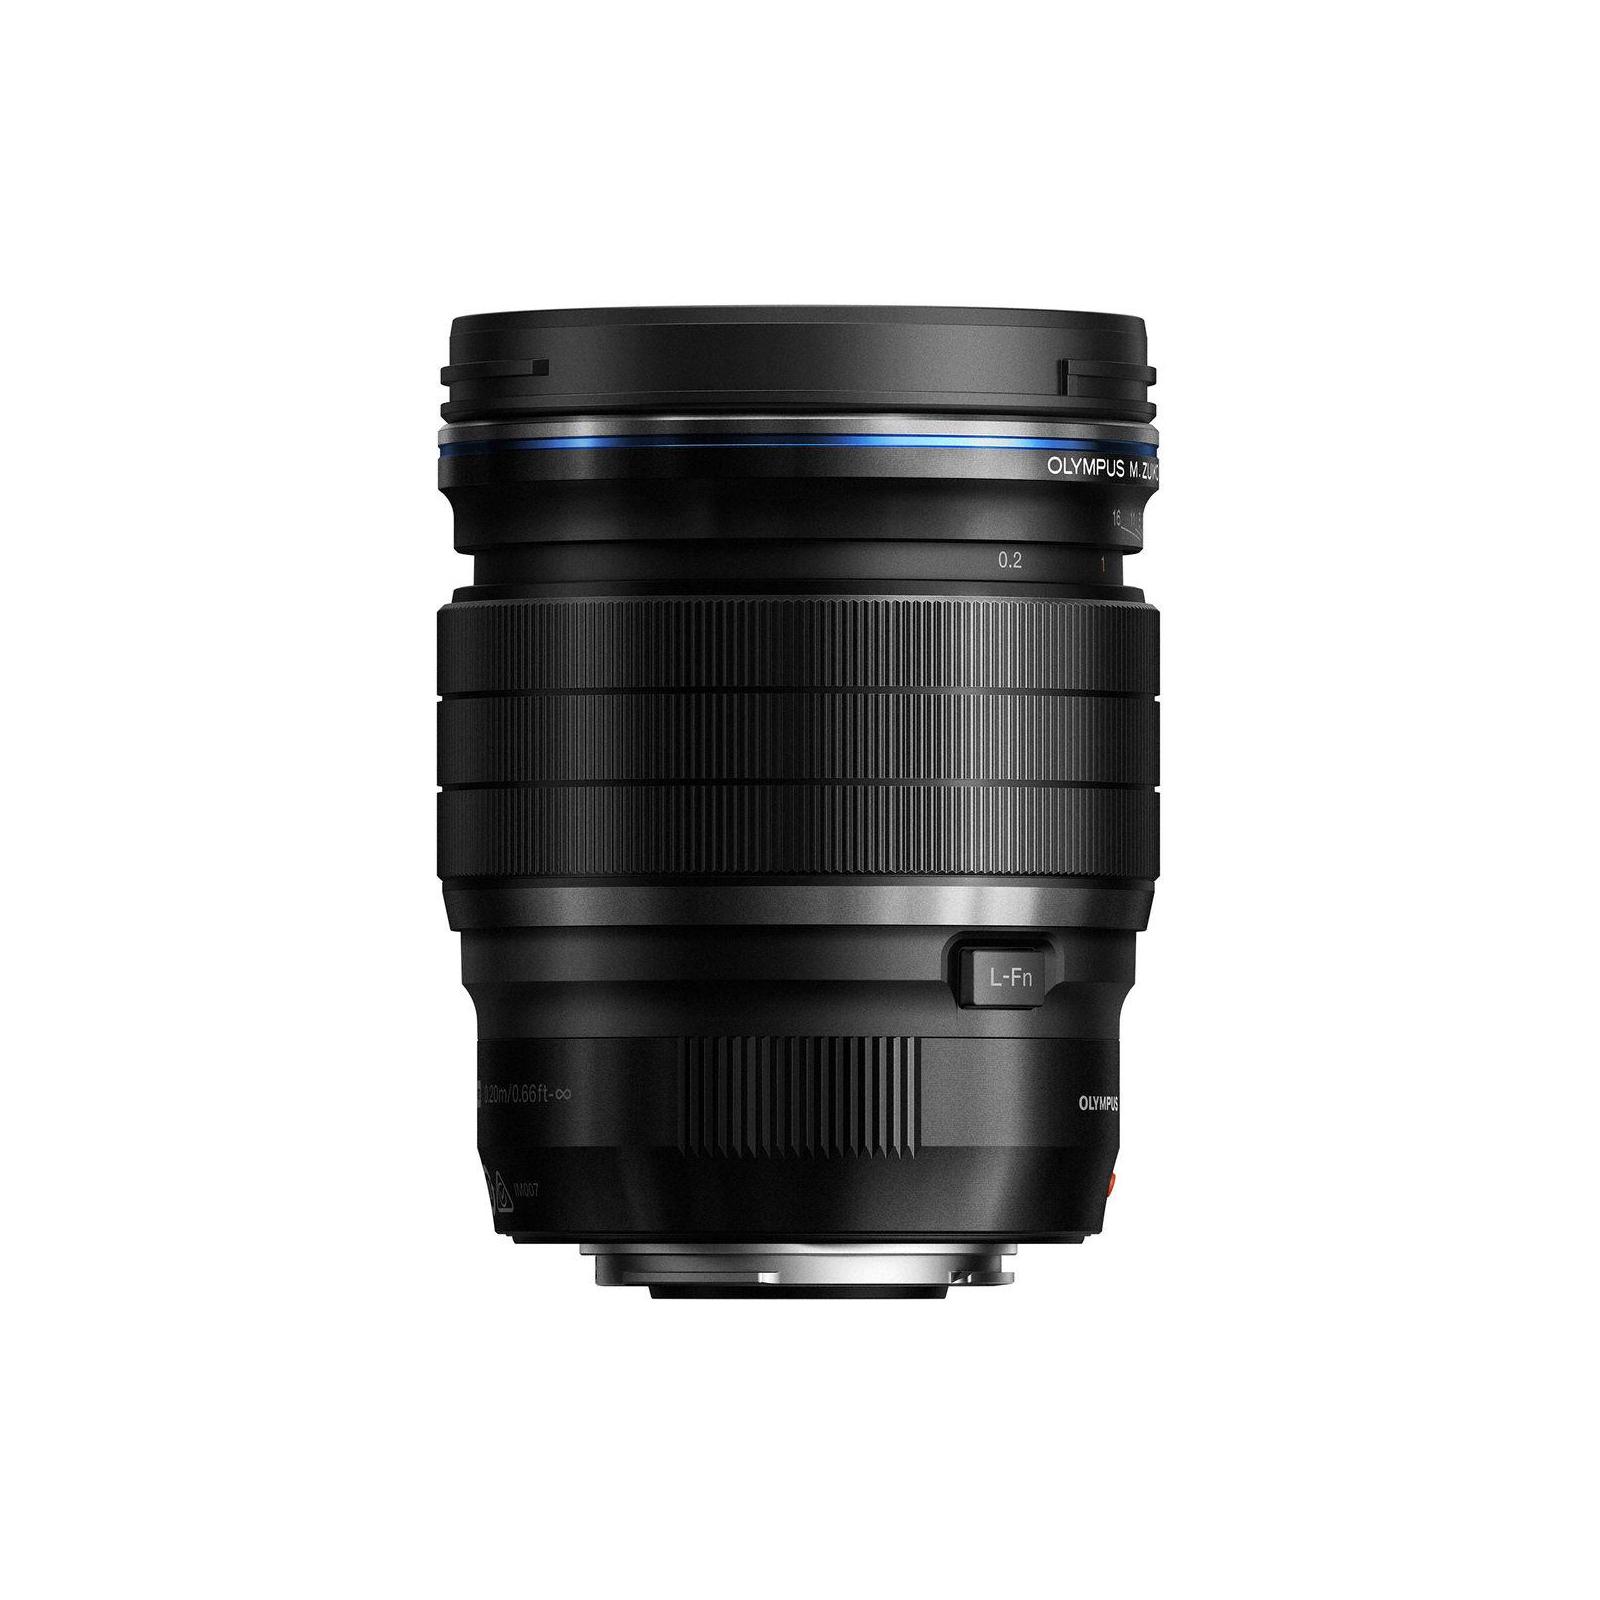 Объектив OLYMPUS EW-M1712 17mm 1:1.2 PRO Black (V311100BW000) изображение 2